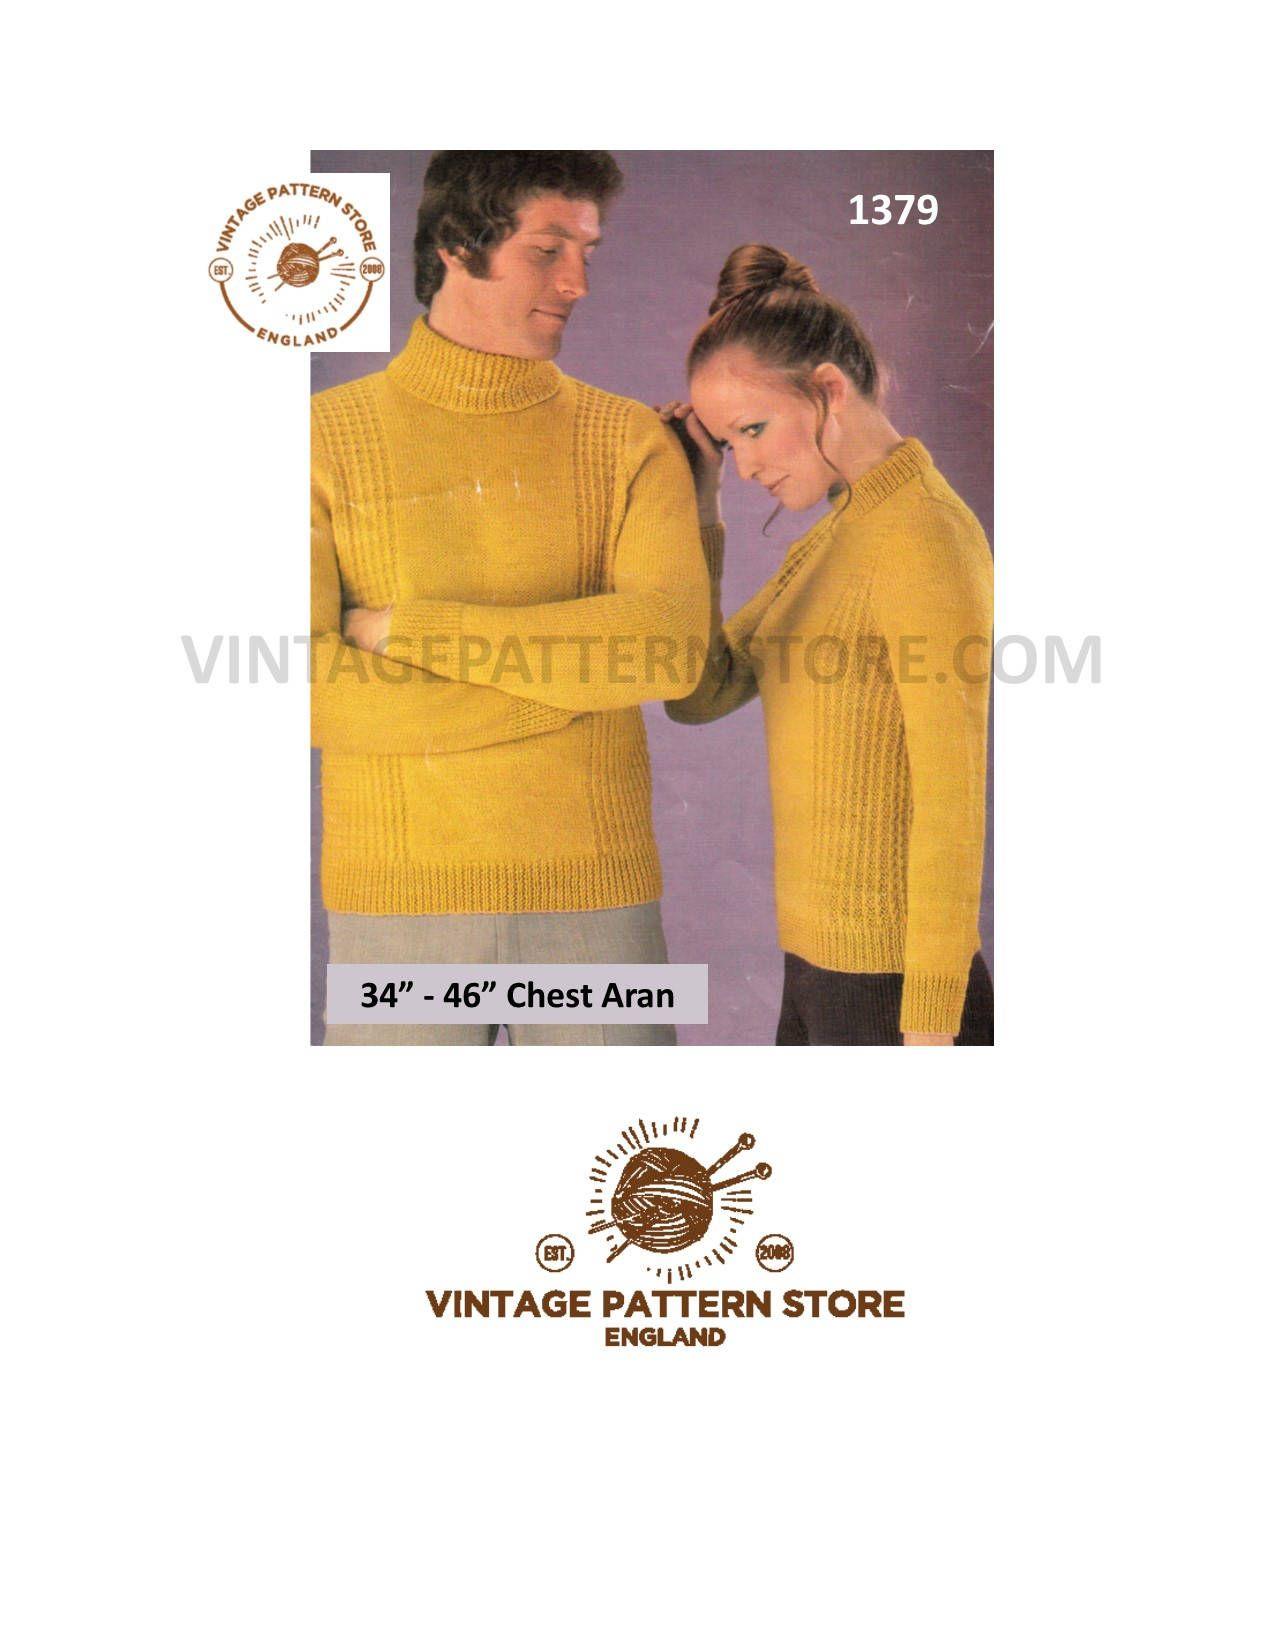 Ladies Velour V-Neck Sweater 70/'s easy knitting pattern Vintage 1970/'s Women/'s Knitting Pattern Instant download PDF e pattern